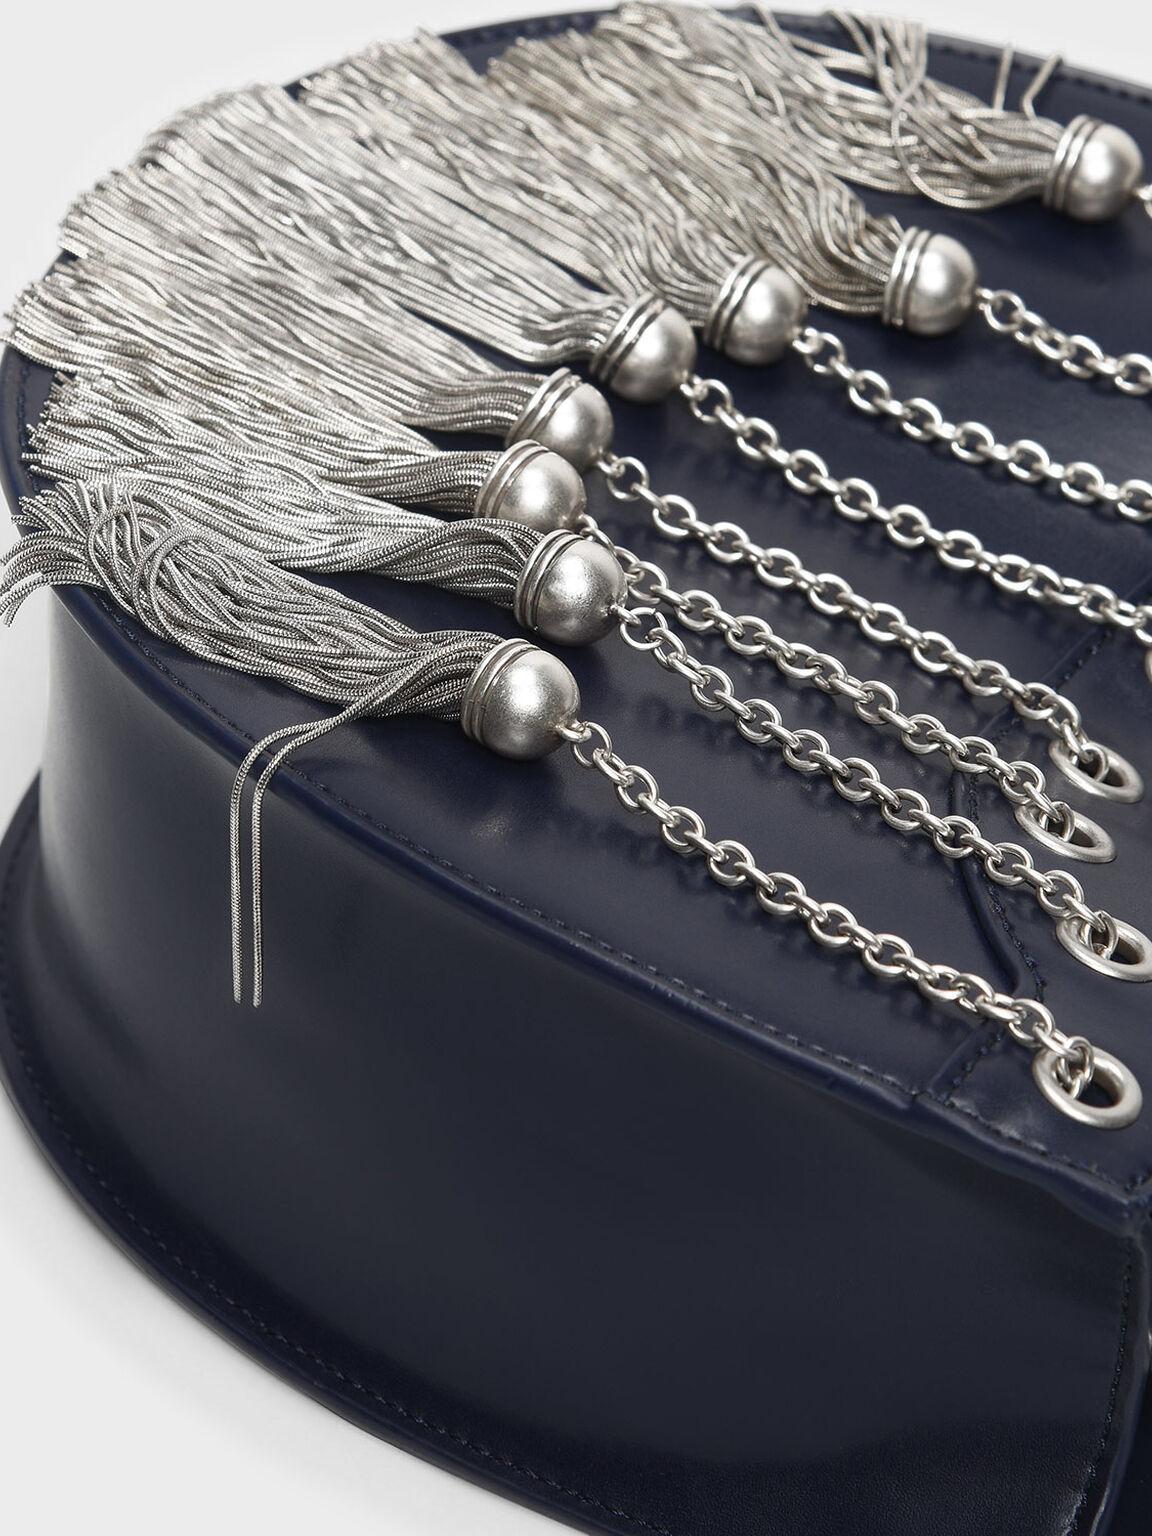 Tassel Detail Hobo Bag, Dark Blue, hi-res